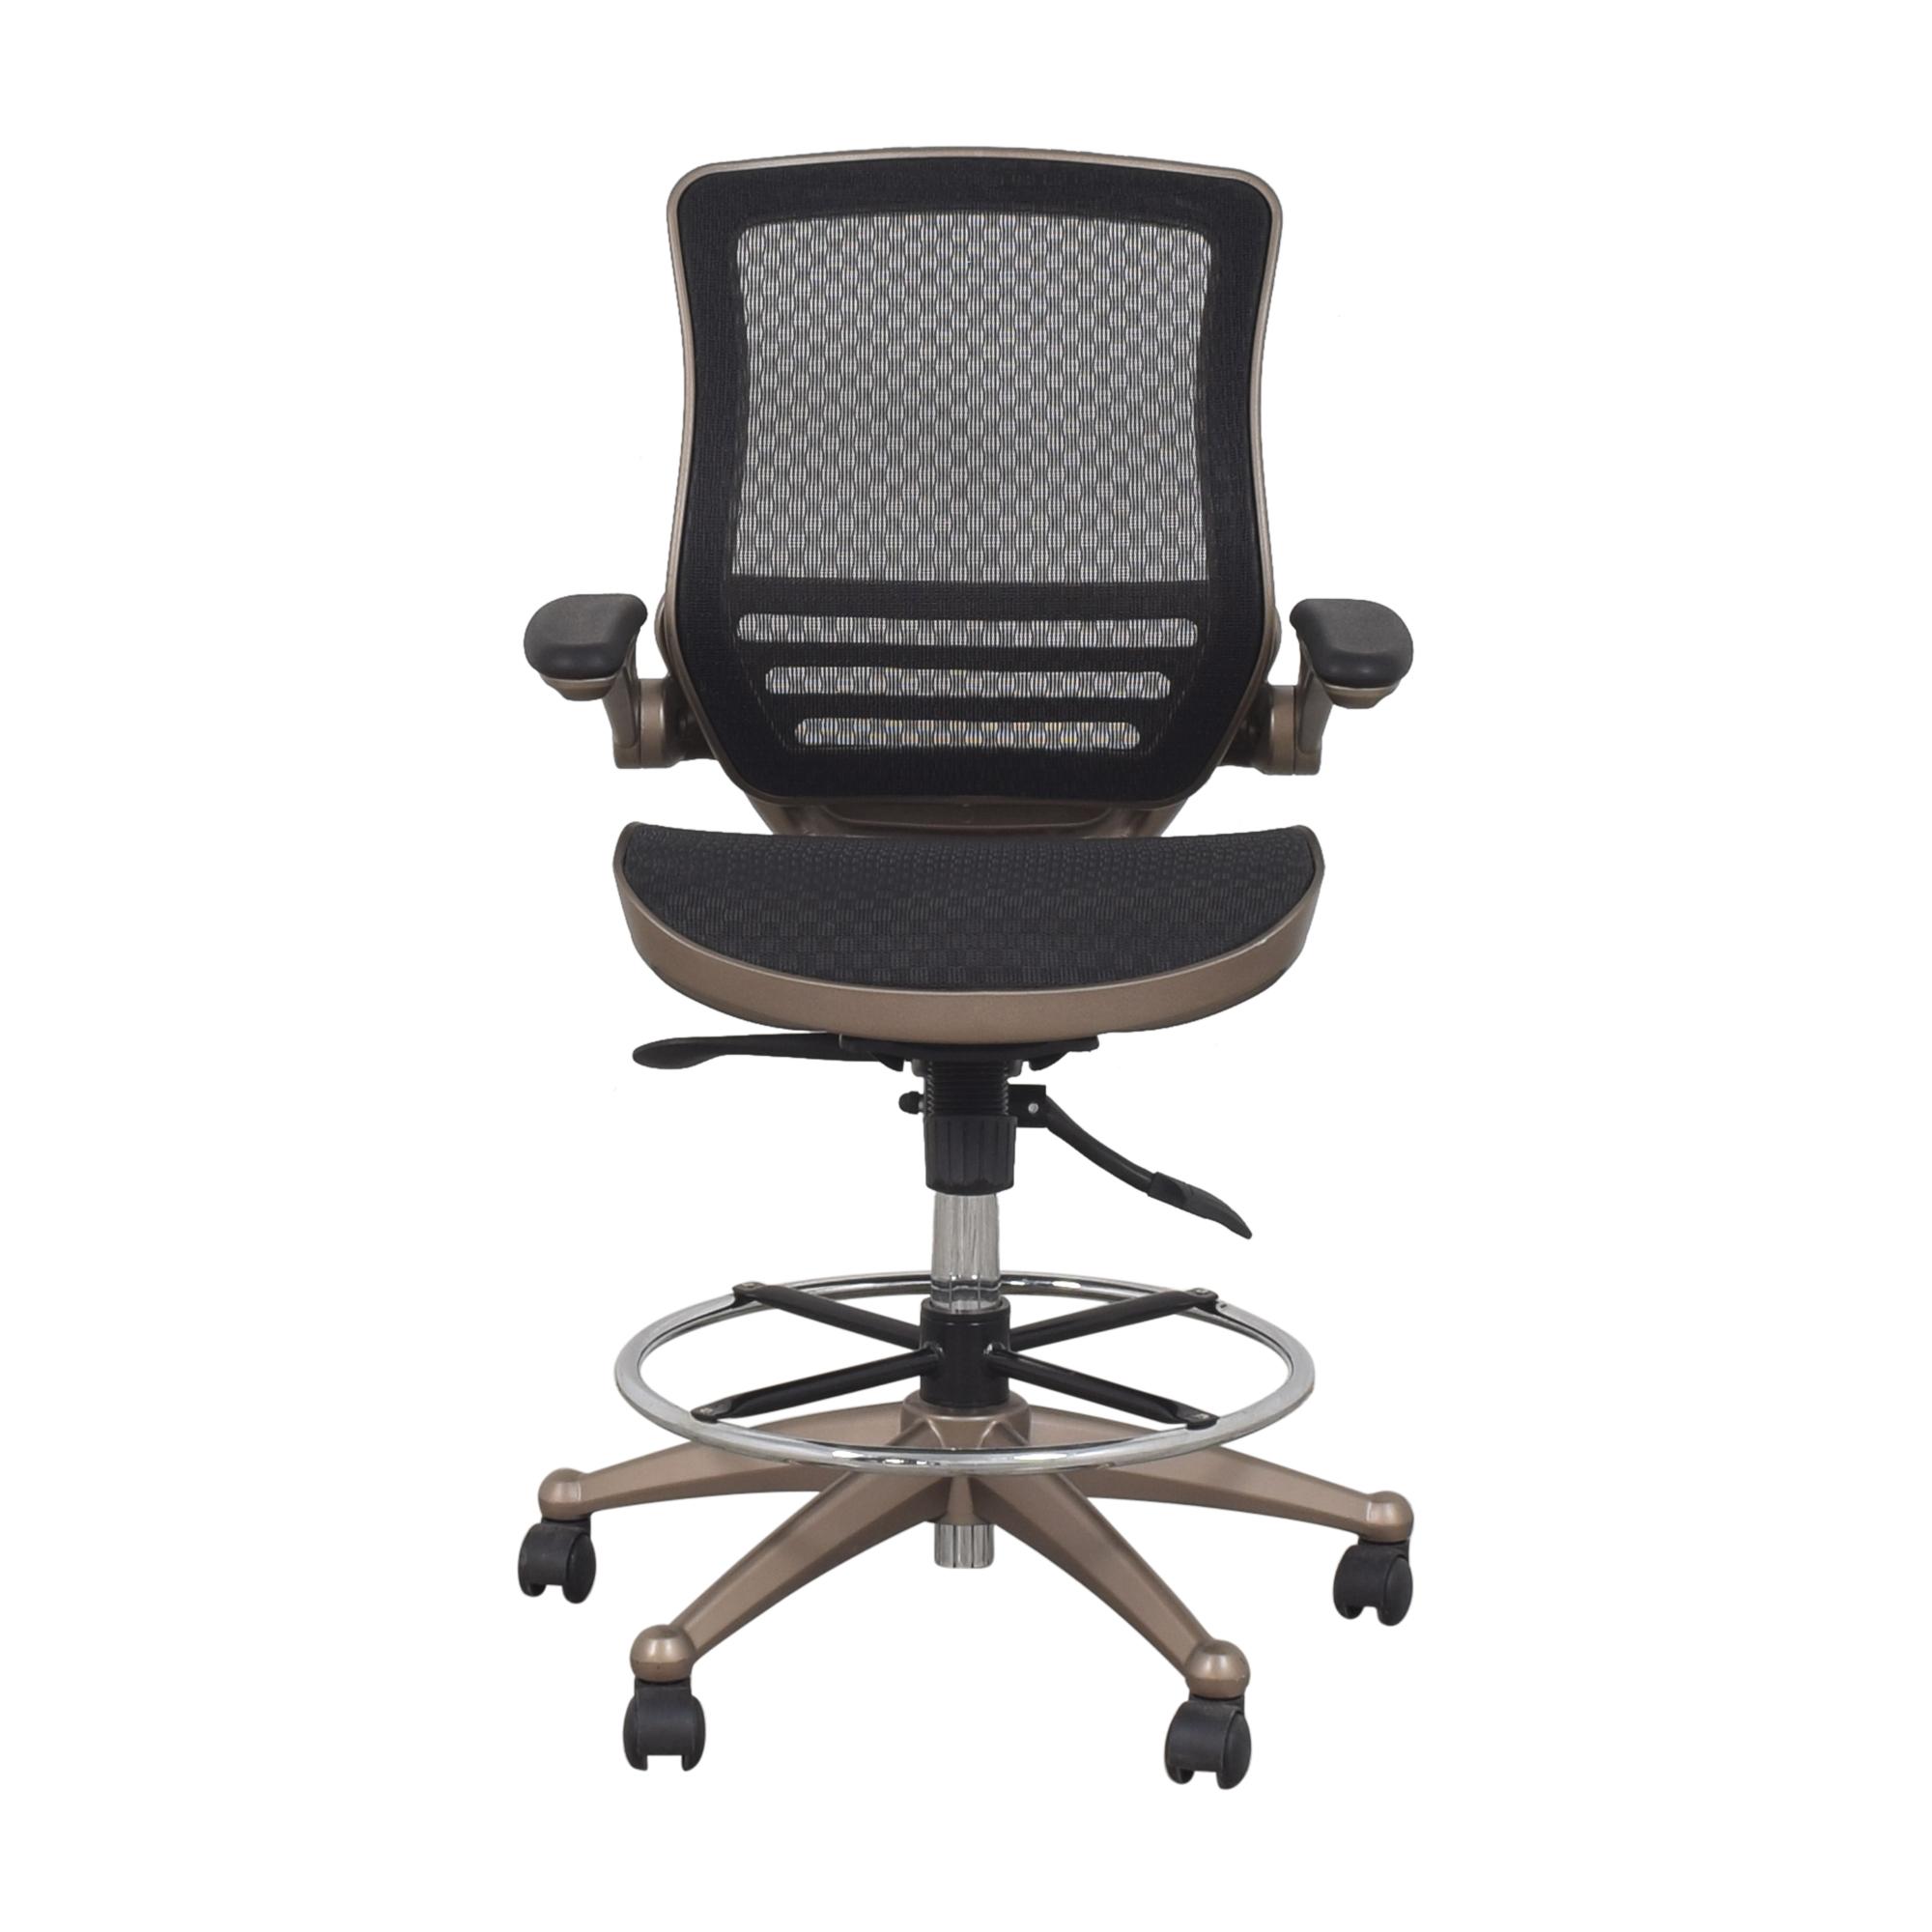 Wayfair Wayfair Ebern Designs Mignone Drafting Chair nj